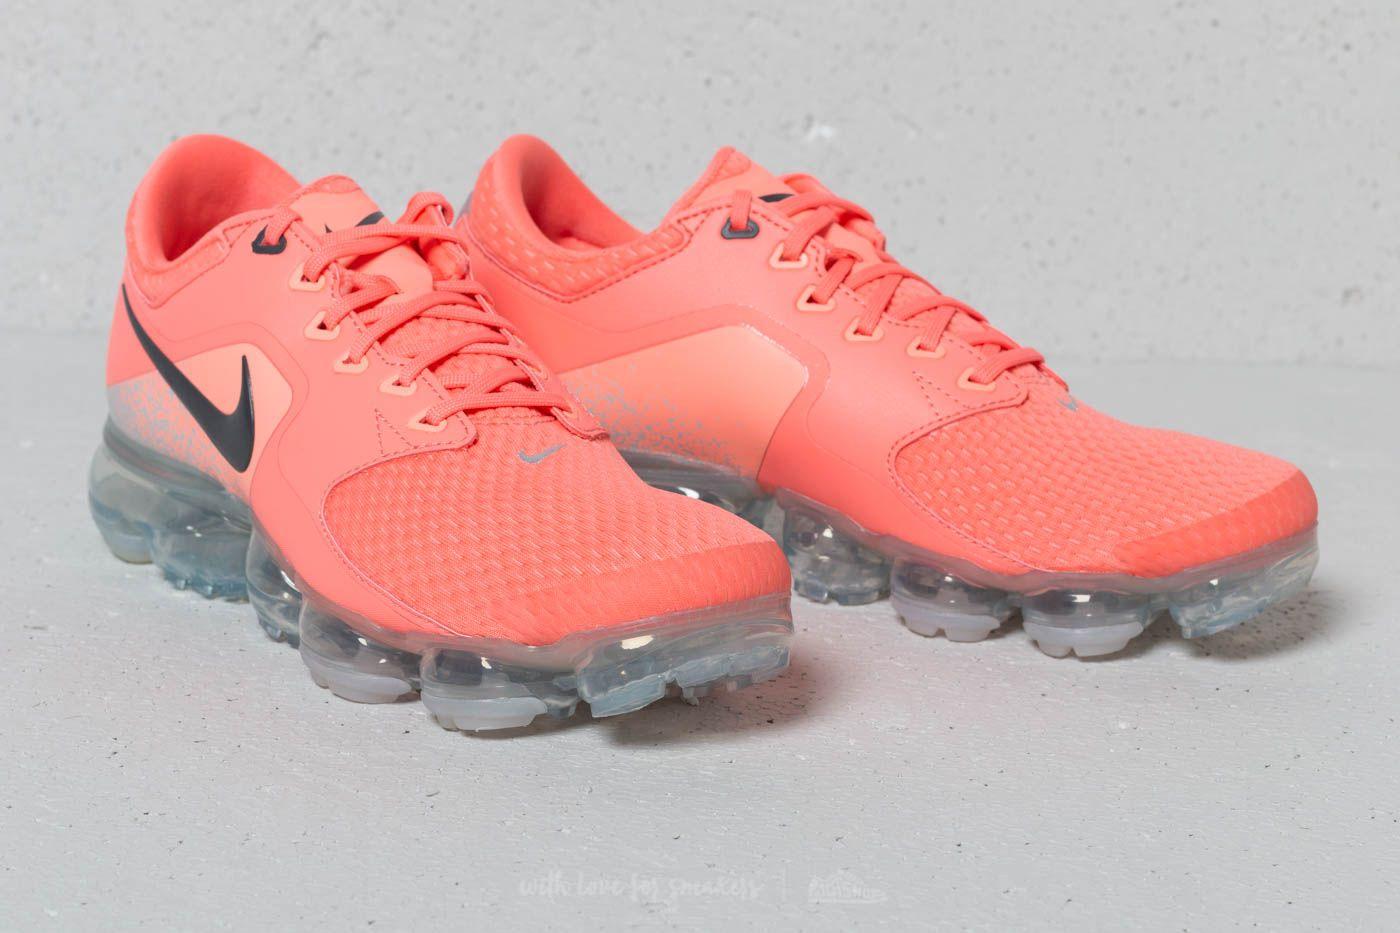 a0ce78af11af Nike Air Vapormax Wmns Light Atomic  Dark Grey at a great price 191 € buy